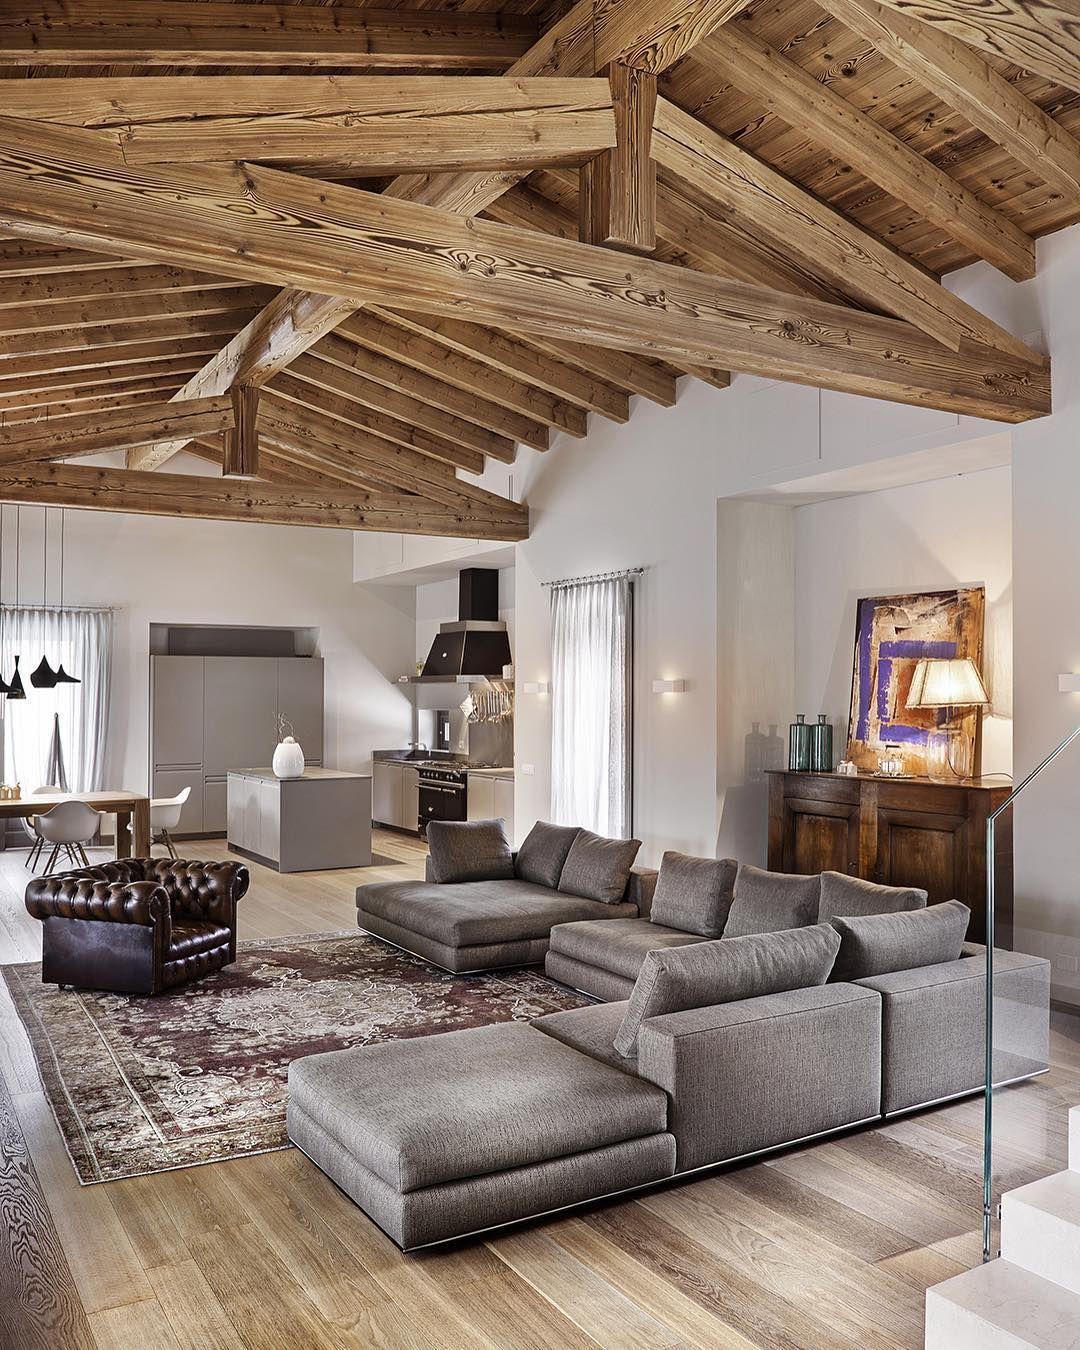 Michele notarangelo on instagram correva quin 8 for Arredamento case antiche